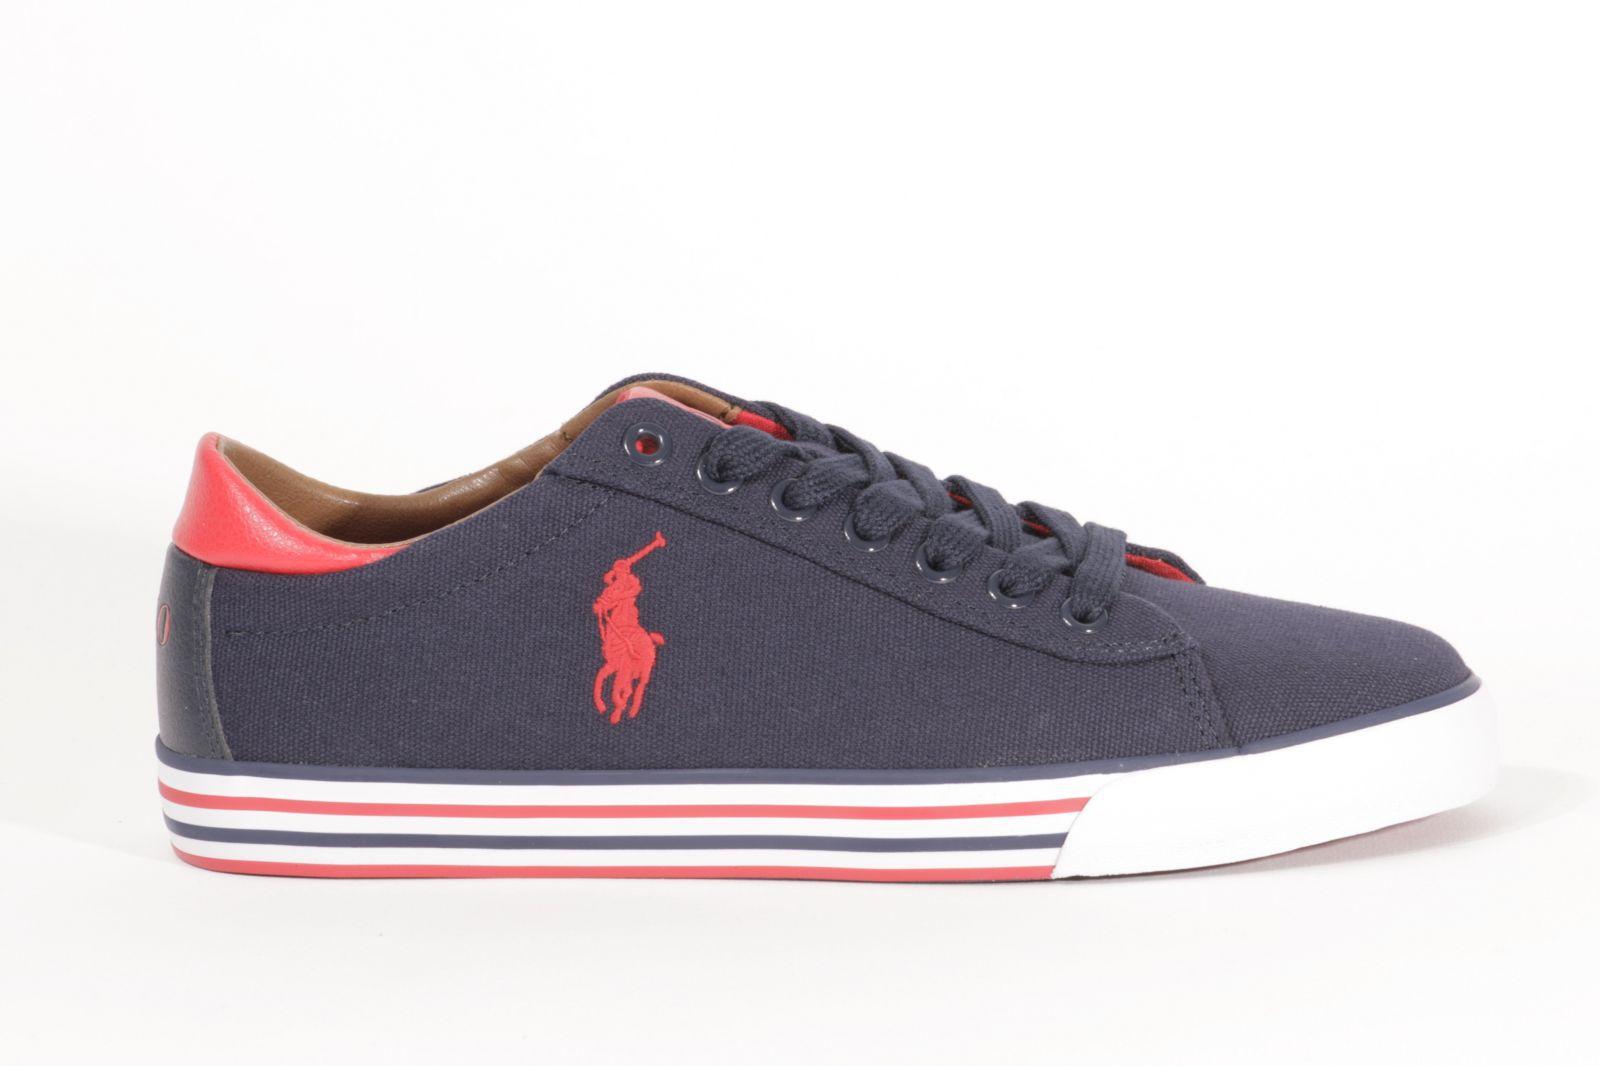 best sneakers 9cbe0 f8fa7 Polo Ralph Lauren Sneaker Blauw heren (Harvey - Harvey) - Rigi